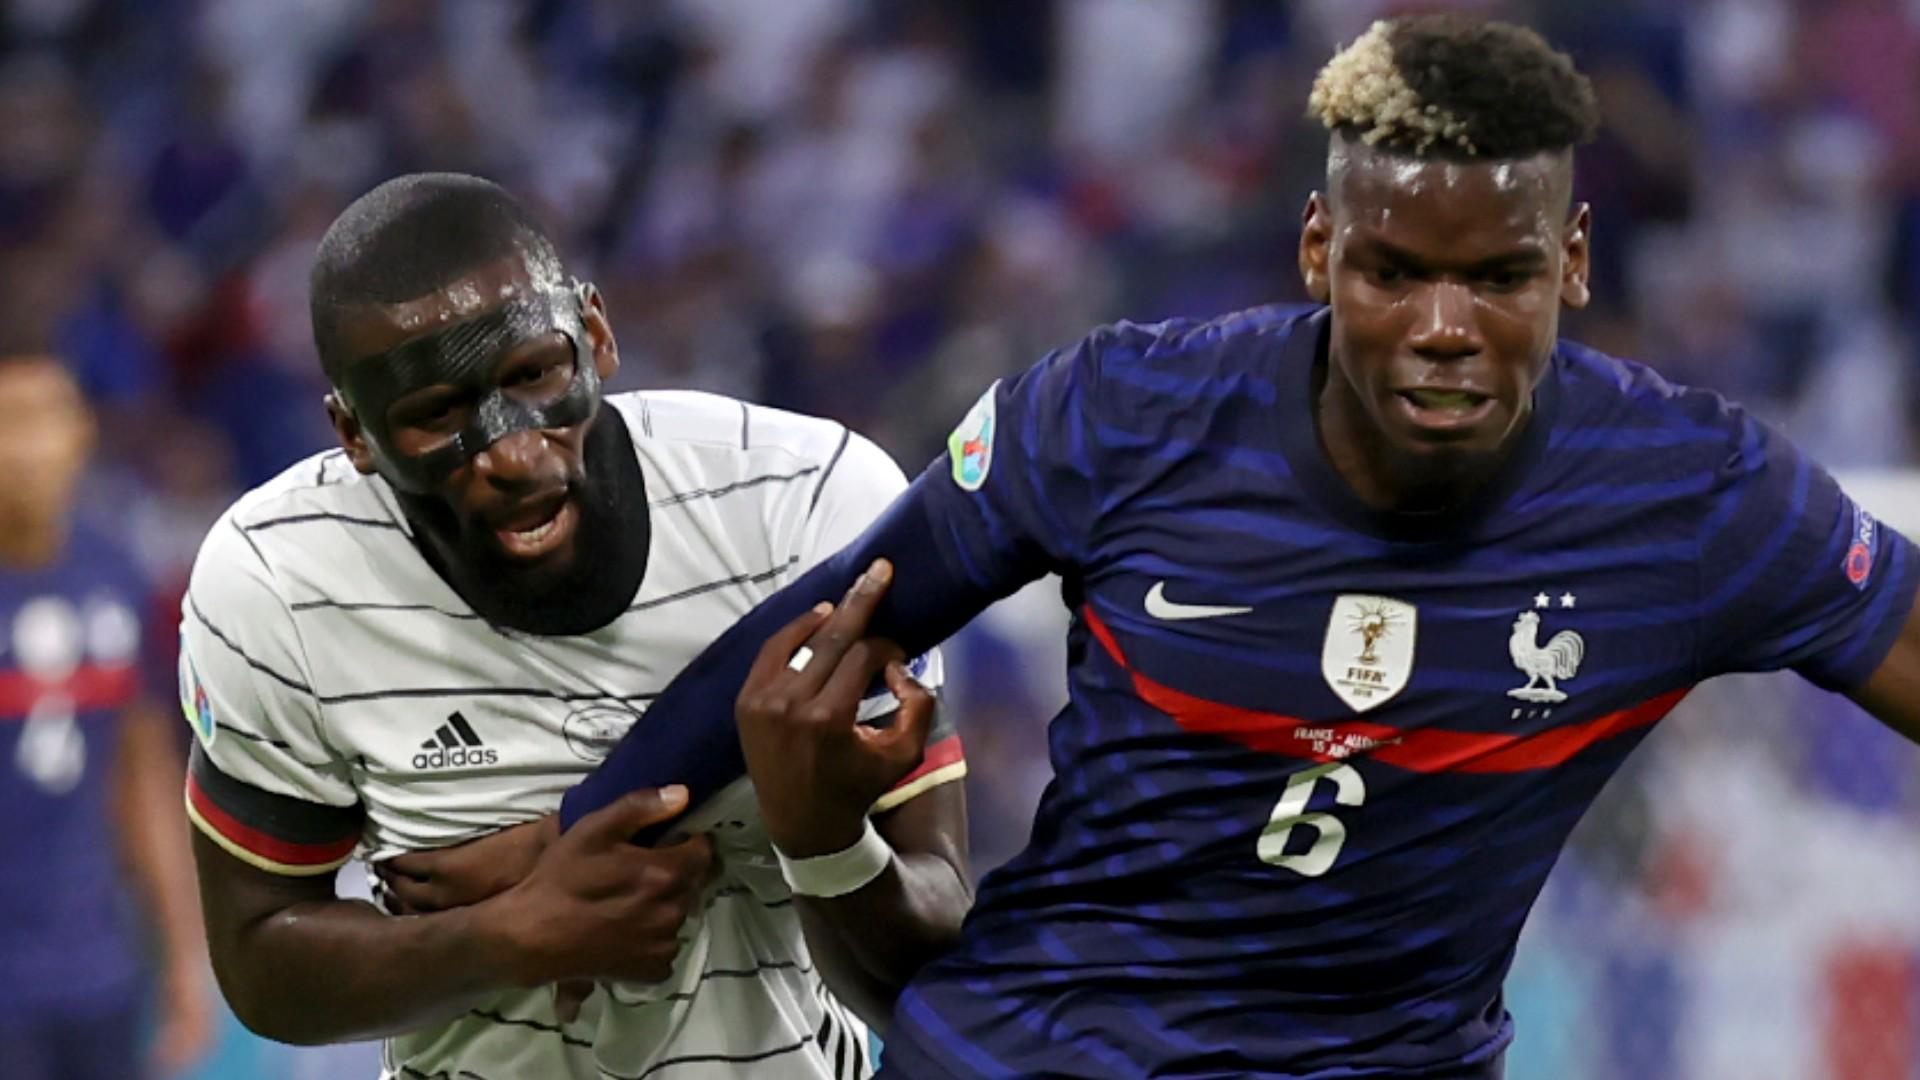 Bite Incident at Euro 2021: Rudiger Appears to Bite Paul Pogba's Back in France vs. Germany